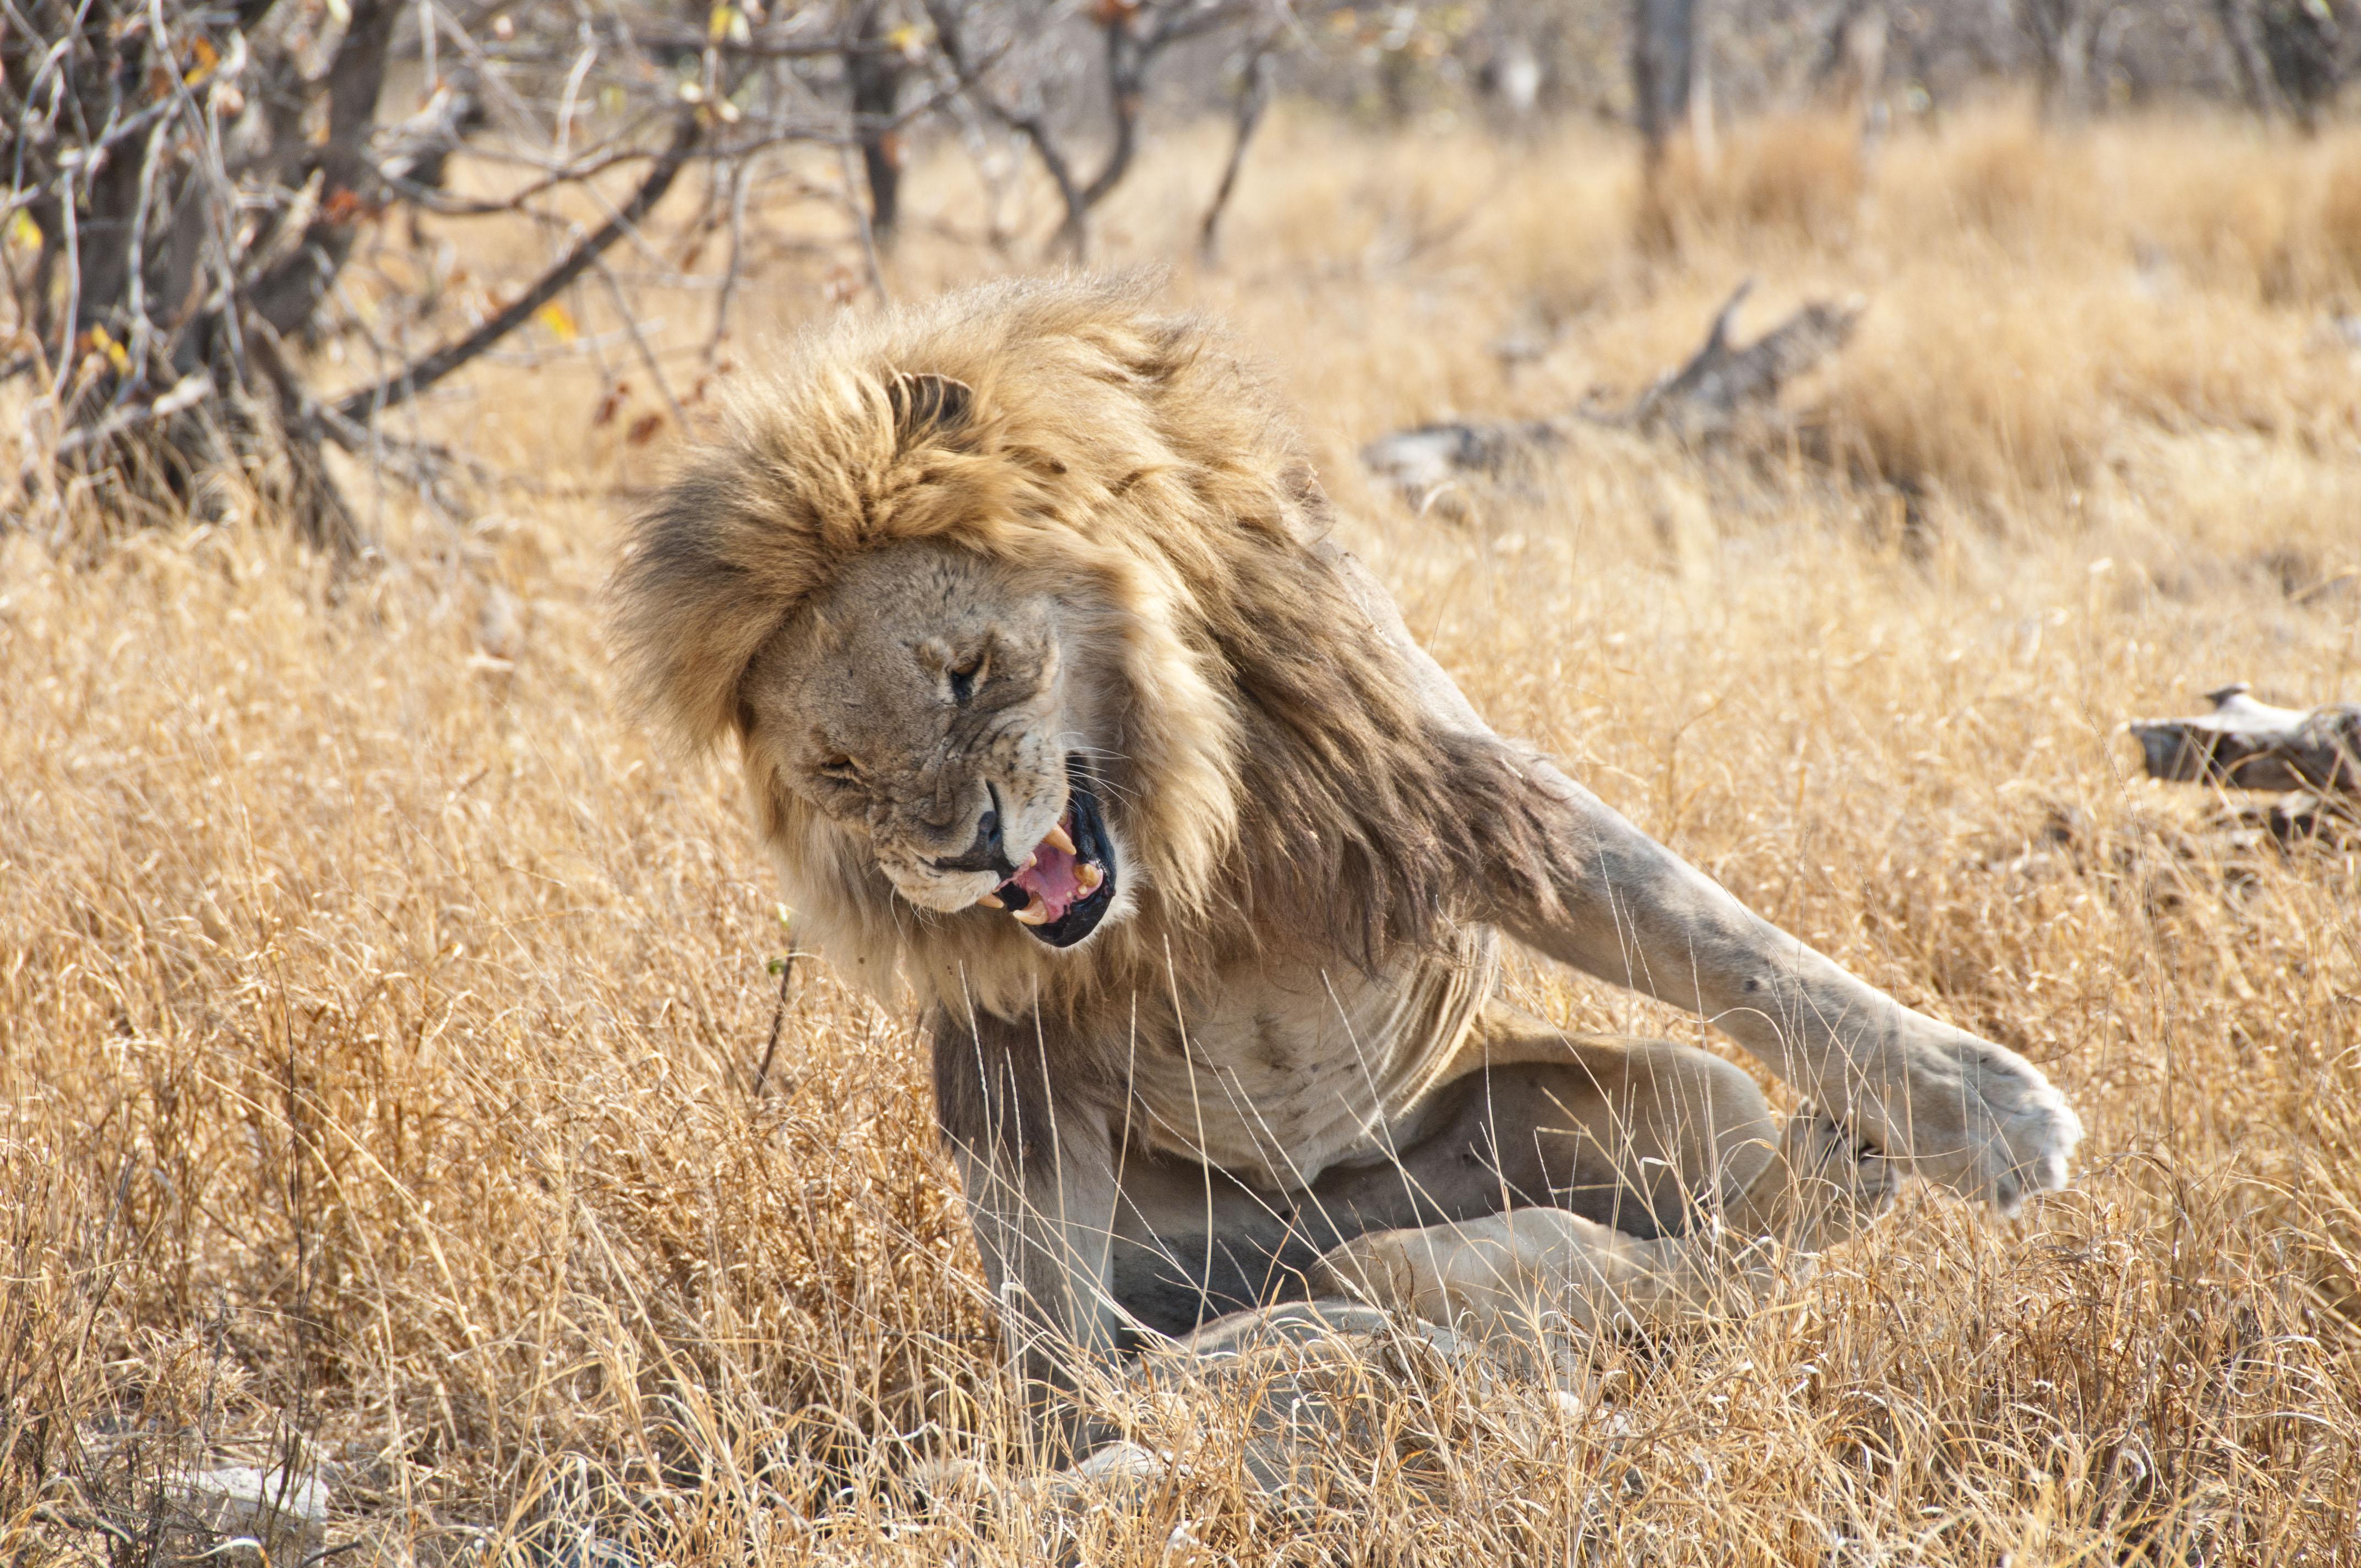 namibia_2014_kaokoveld-etoscha_108